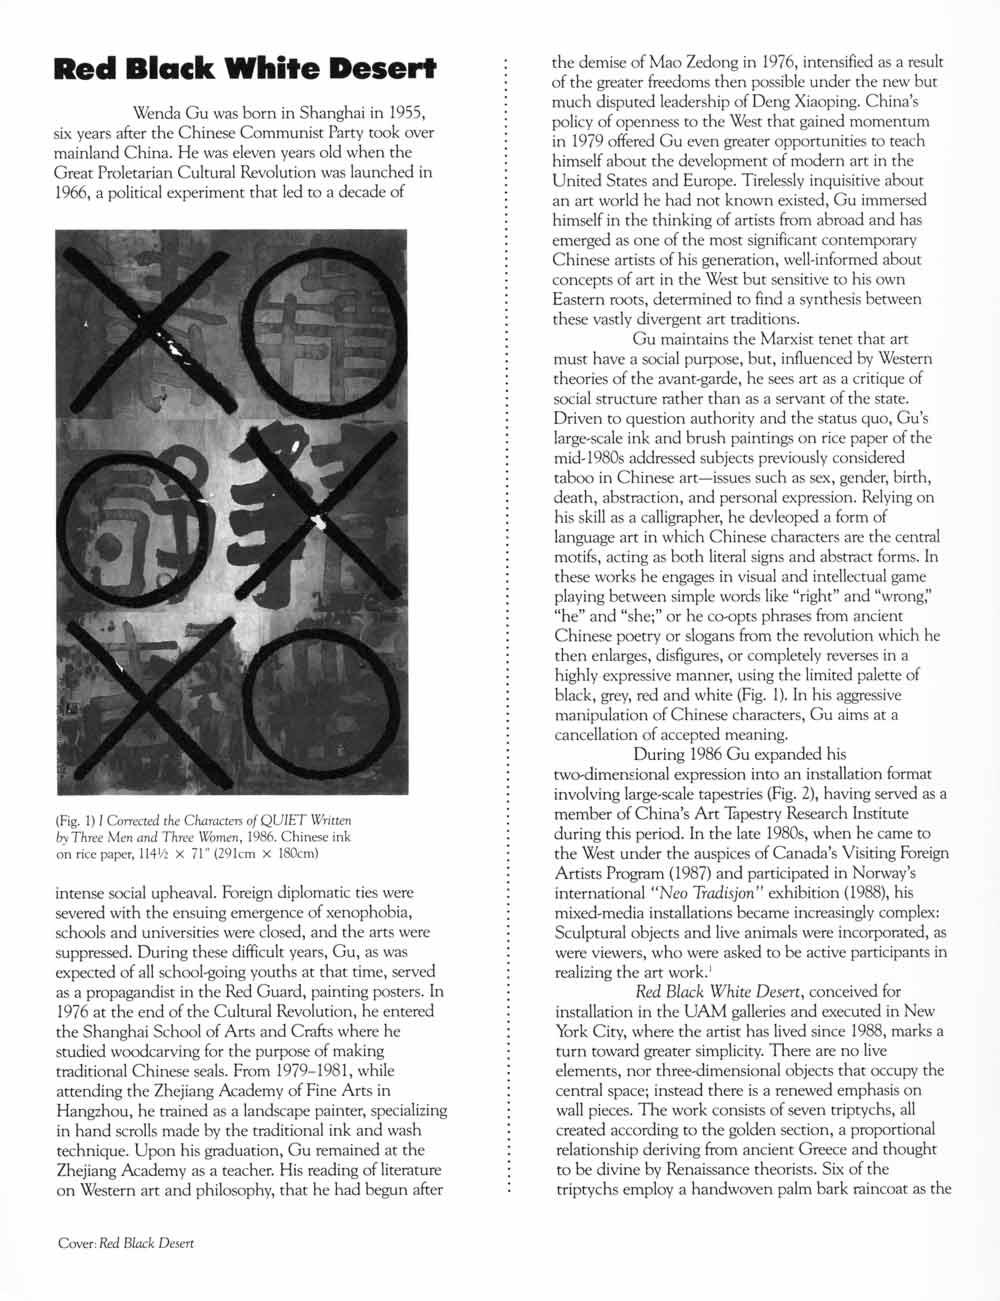 Centric 40 catalog, pg 1